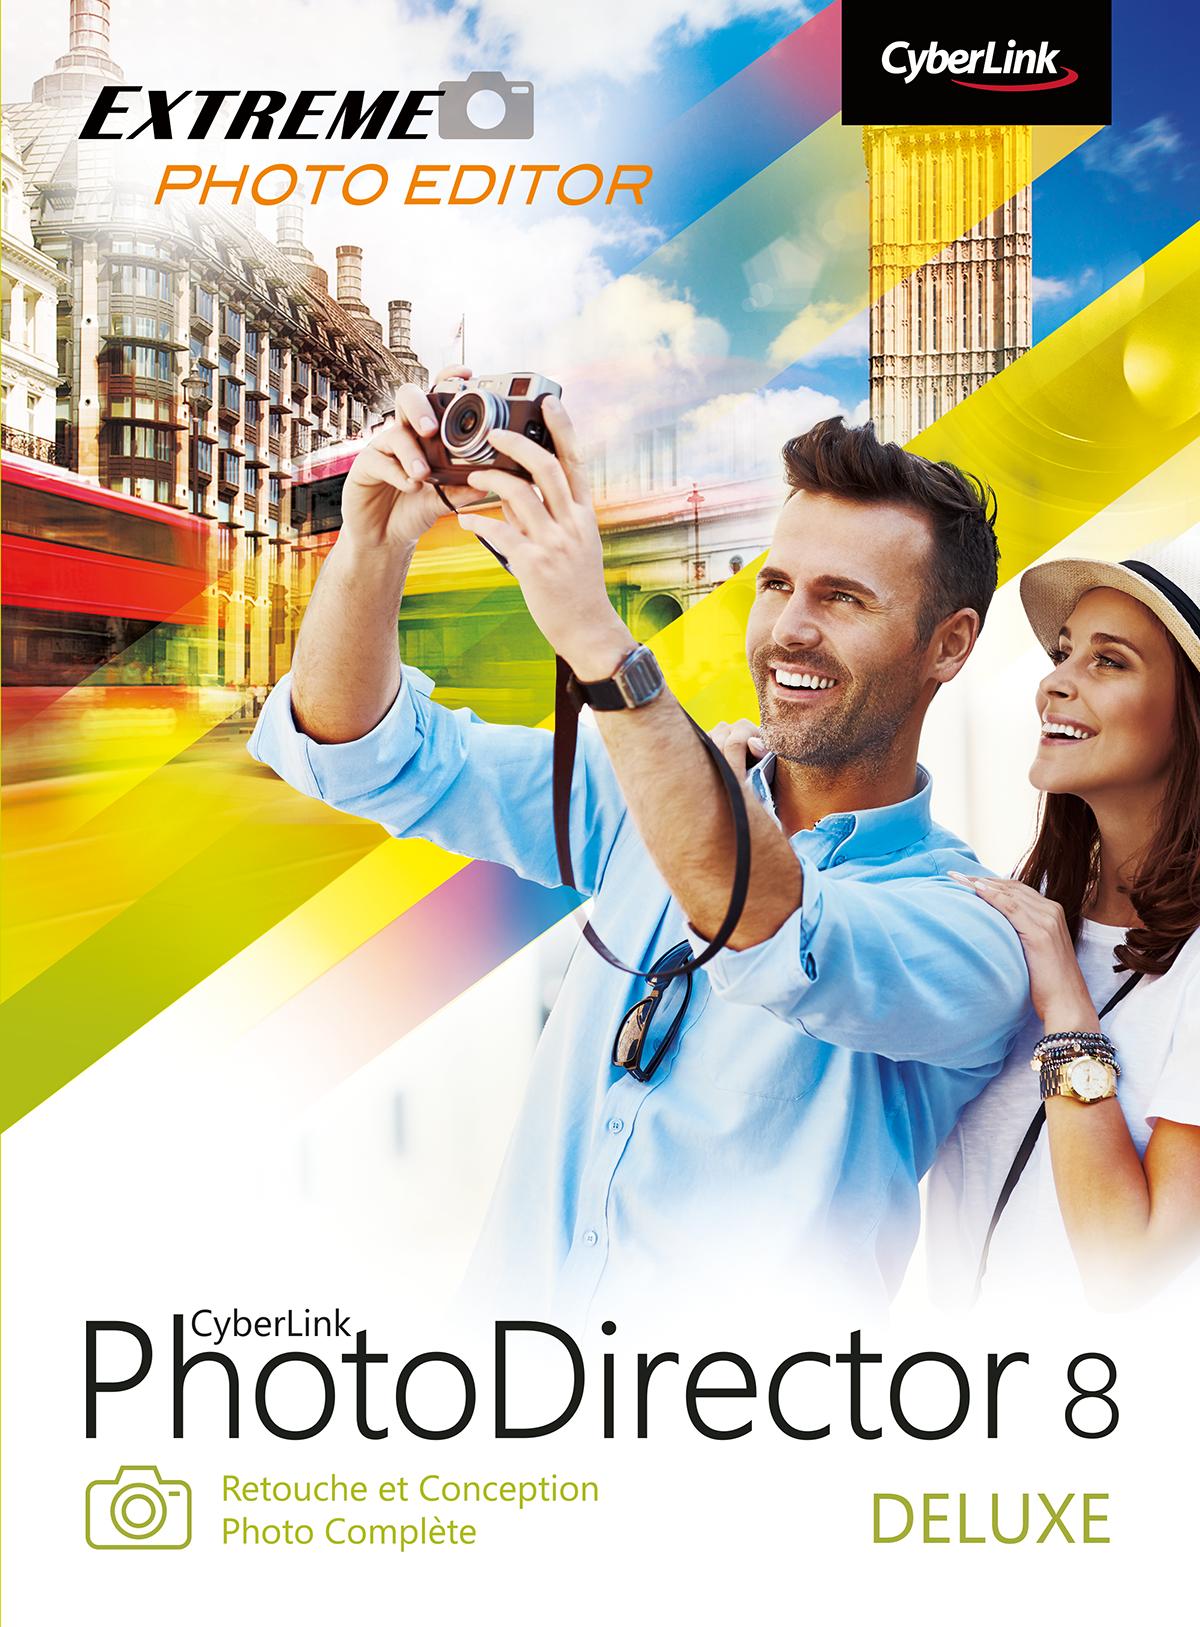 cyberlink-photodirector-8-deluxe-telechargement